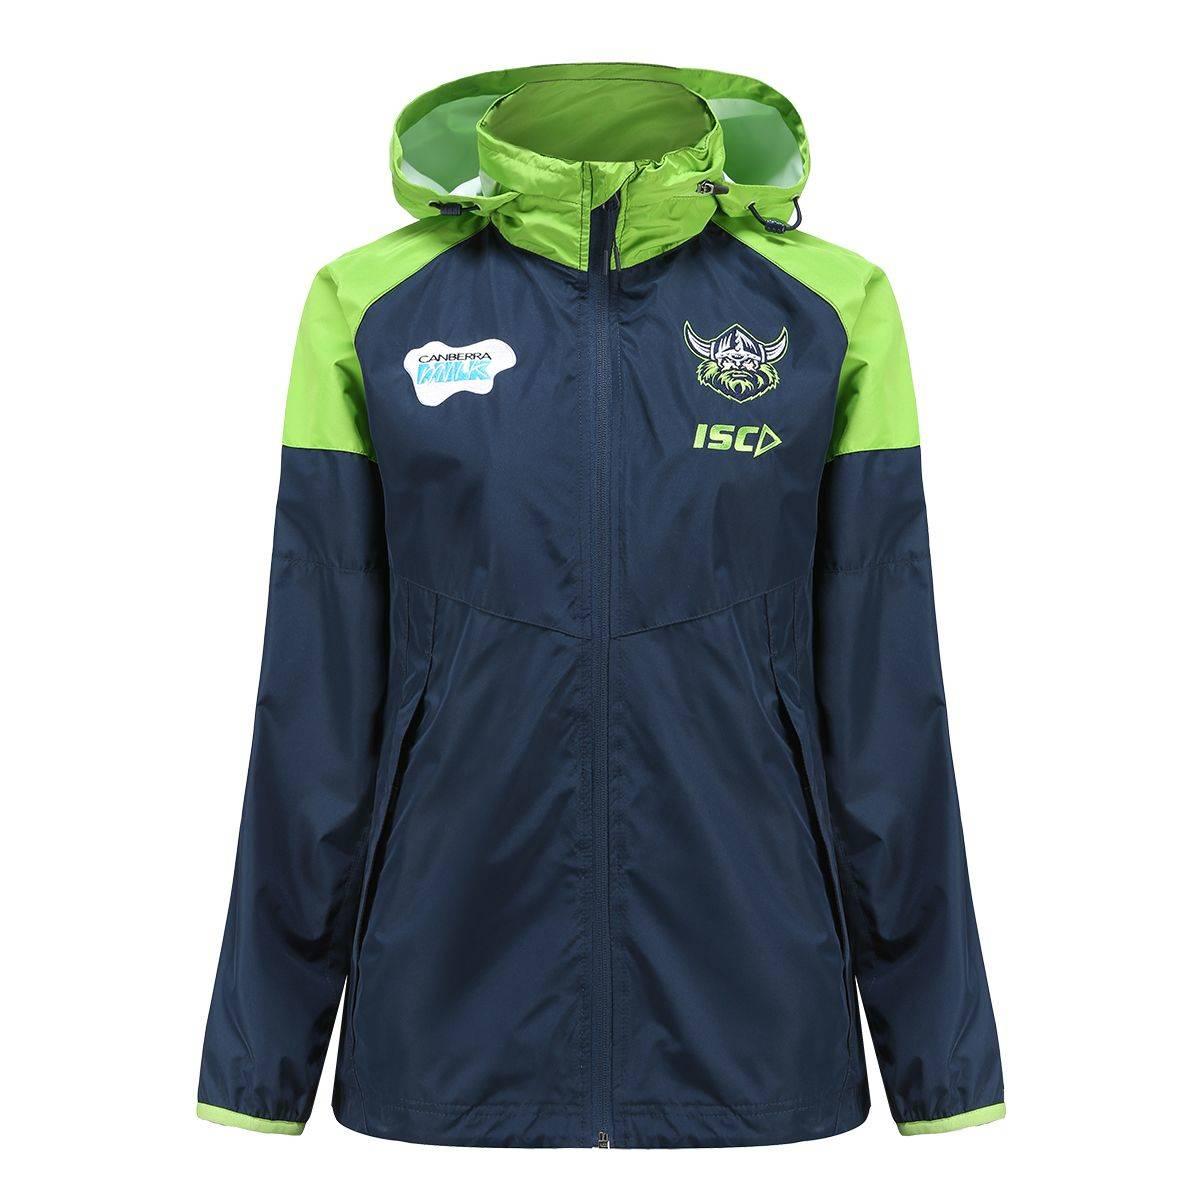 2021 Ladies Wet Weather Jacket0